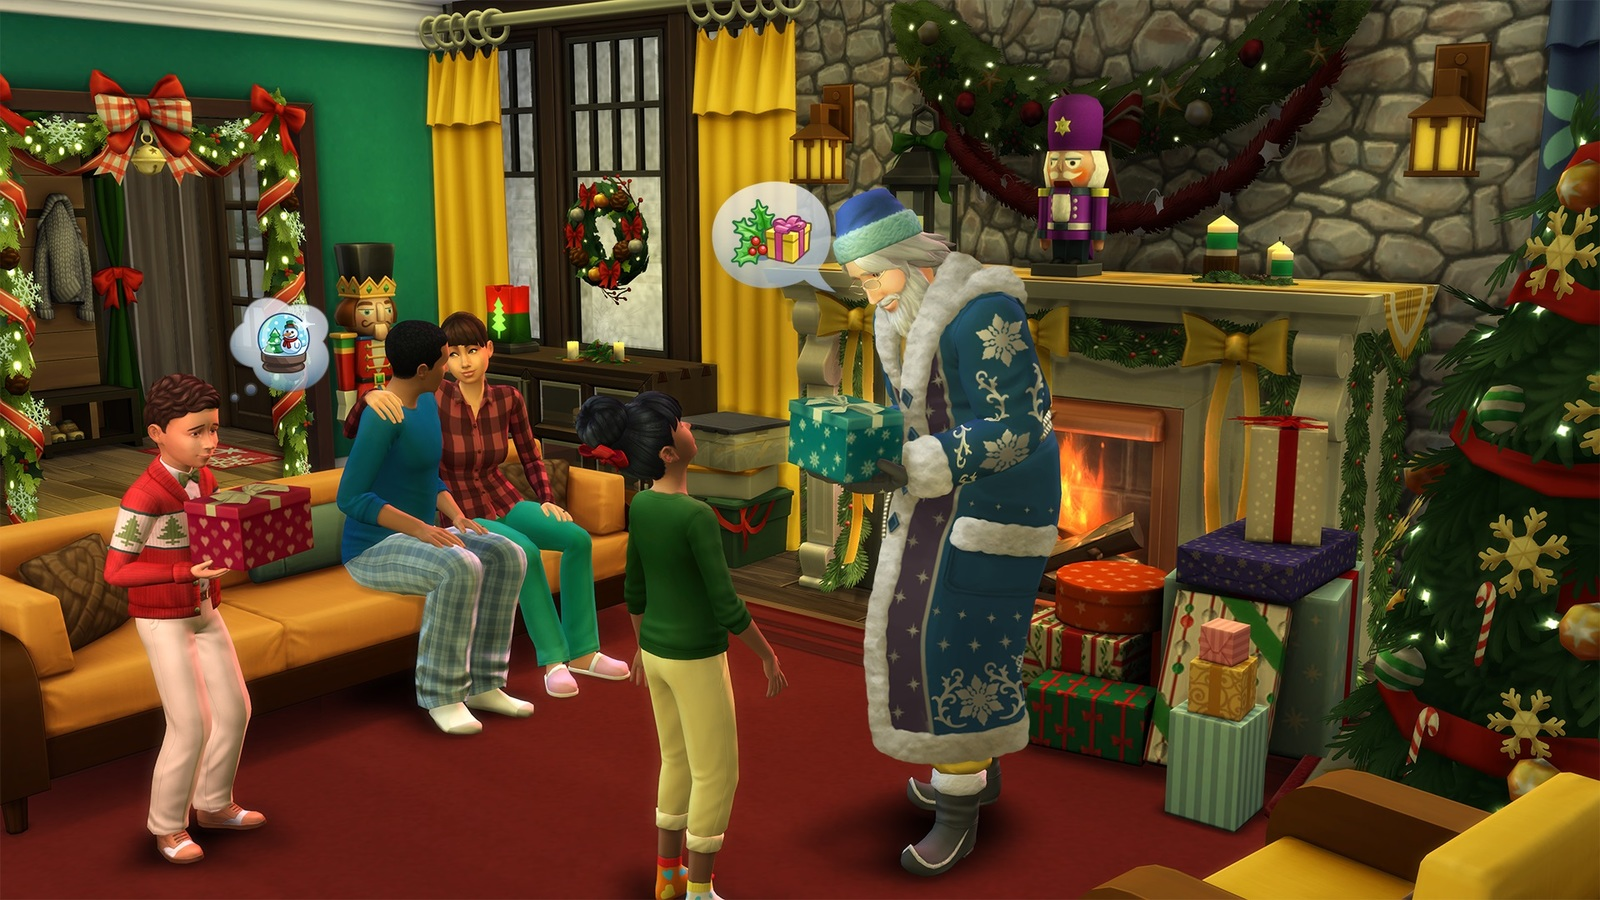 The Sims 4: Seasons (code in box) screenshot